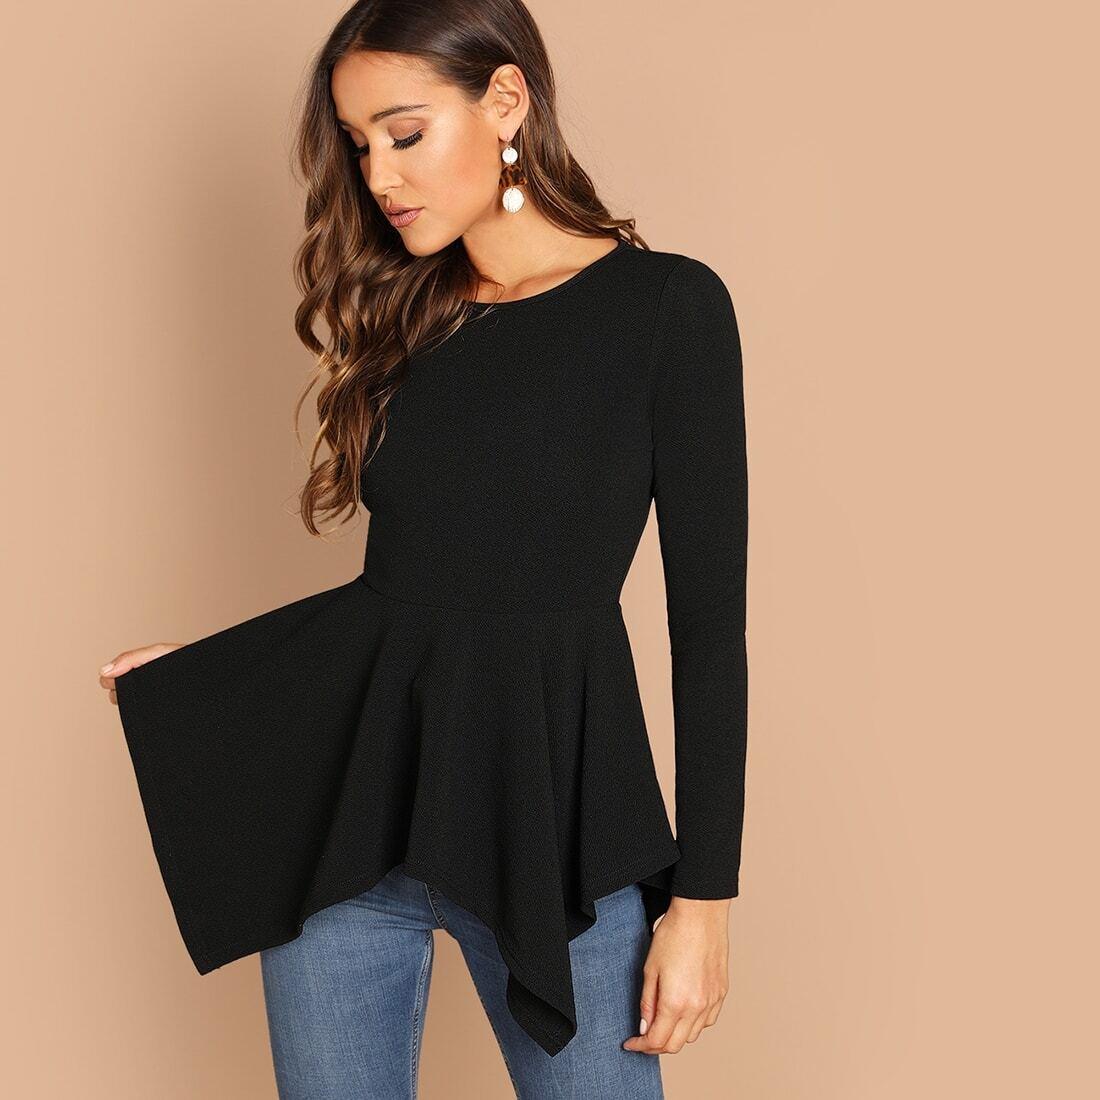 Zwart Elegant Vlak T-shirts Asymmetrisch